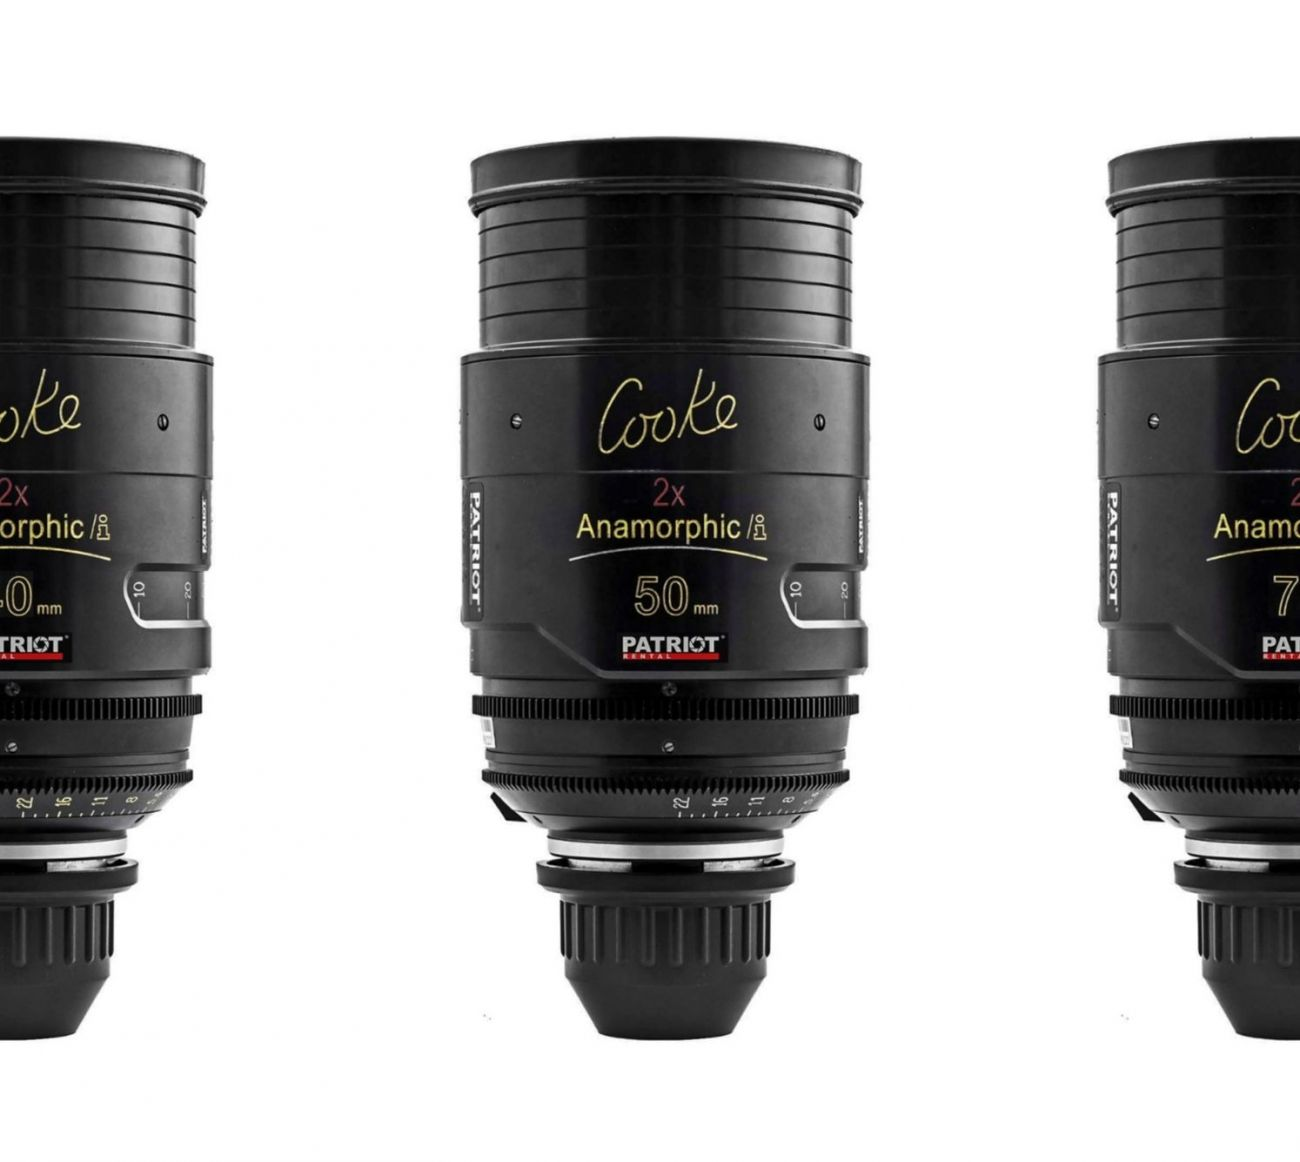 SET COOKE ANAMORPHIC/I 2x Lenses T2.3 32,40,50,75,100mm